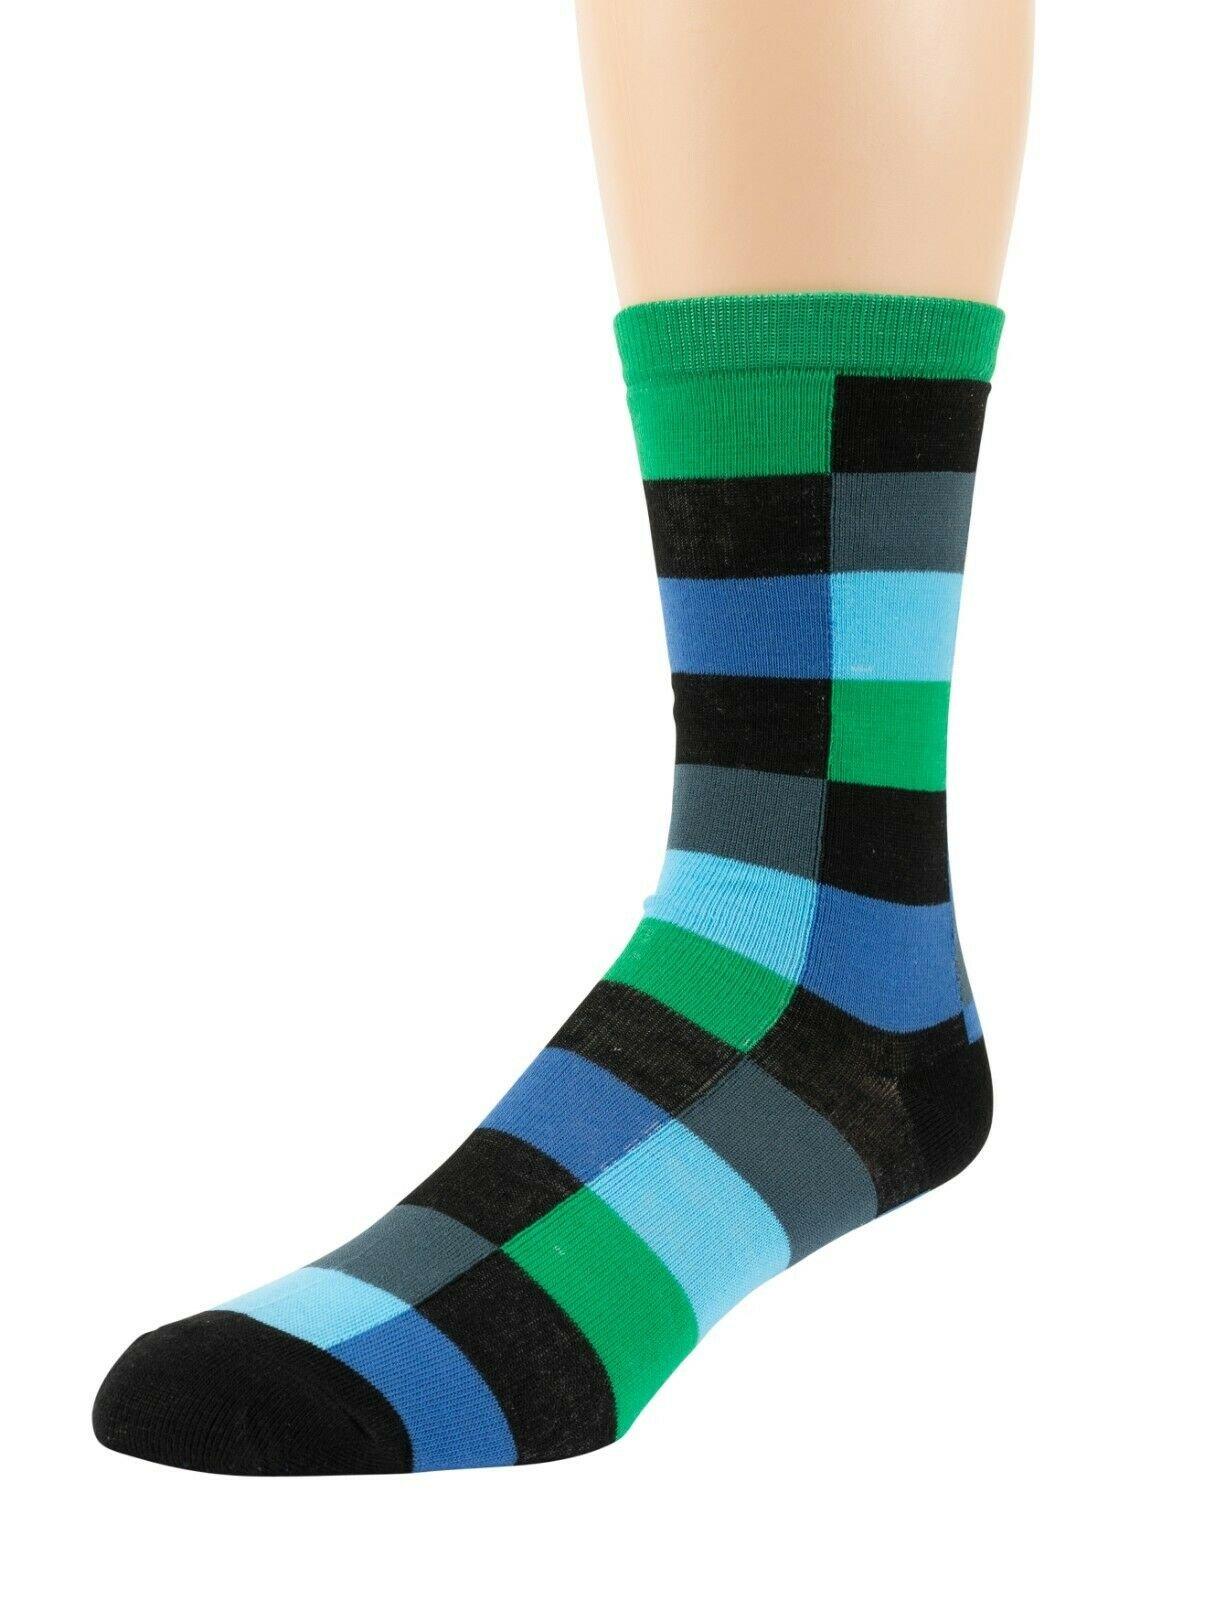 Mitch-Bogen-Mens-Cotton-Dress-Socks-Colorful-Fashion-Crew-Socks-8-Pack-Gift-Box thumbnail 25